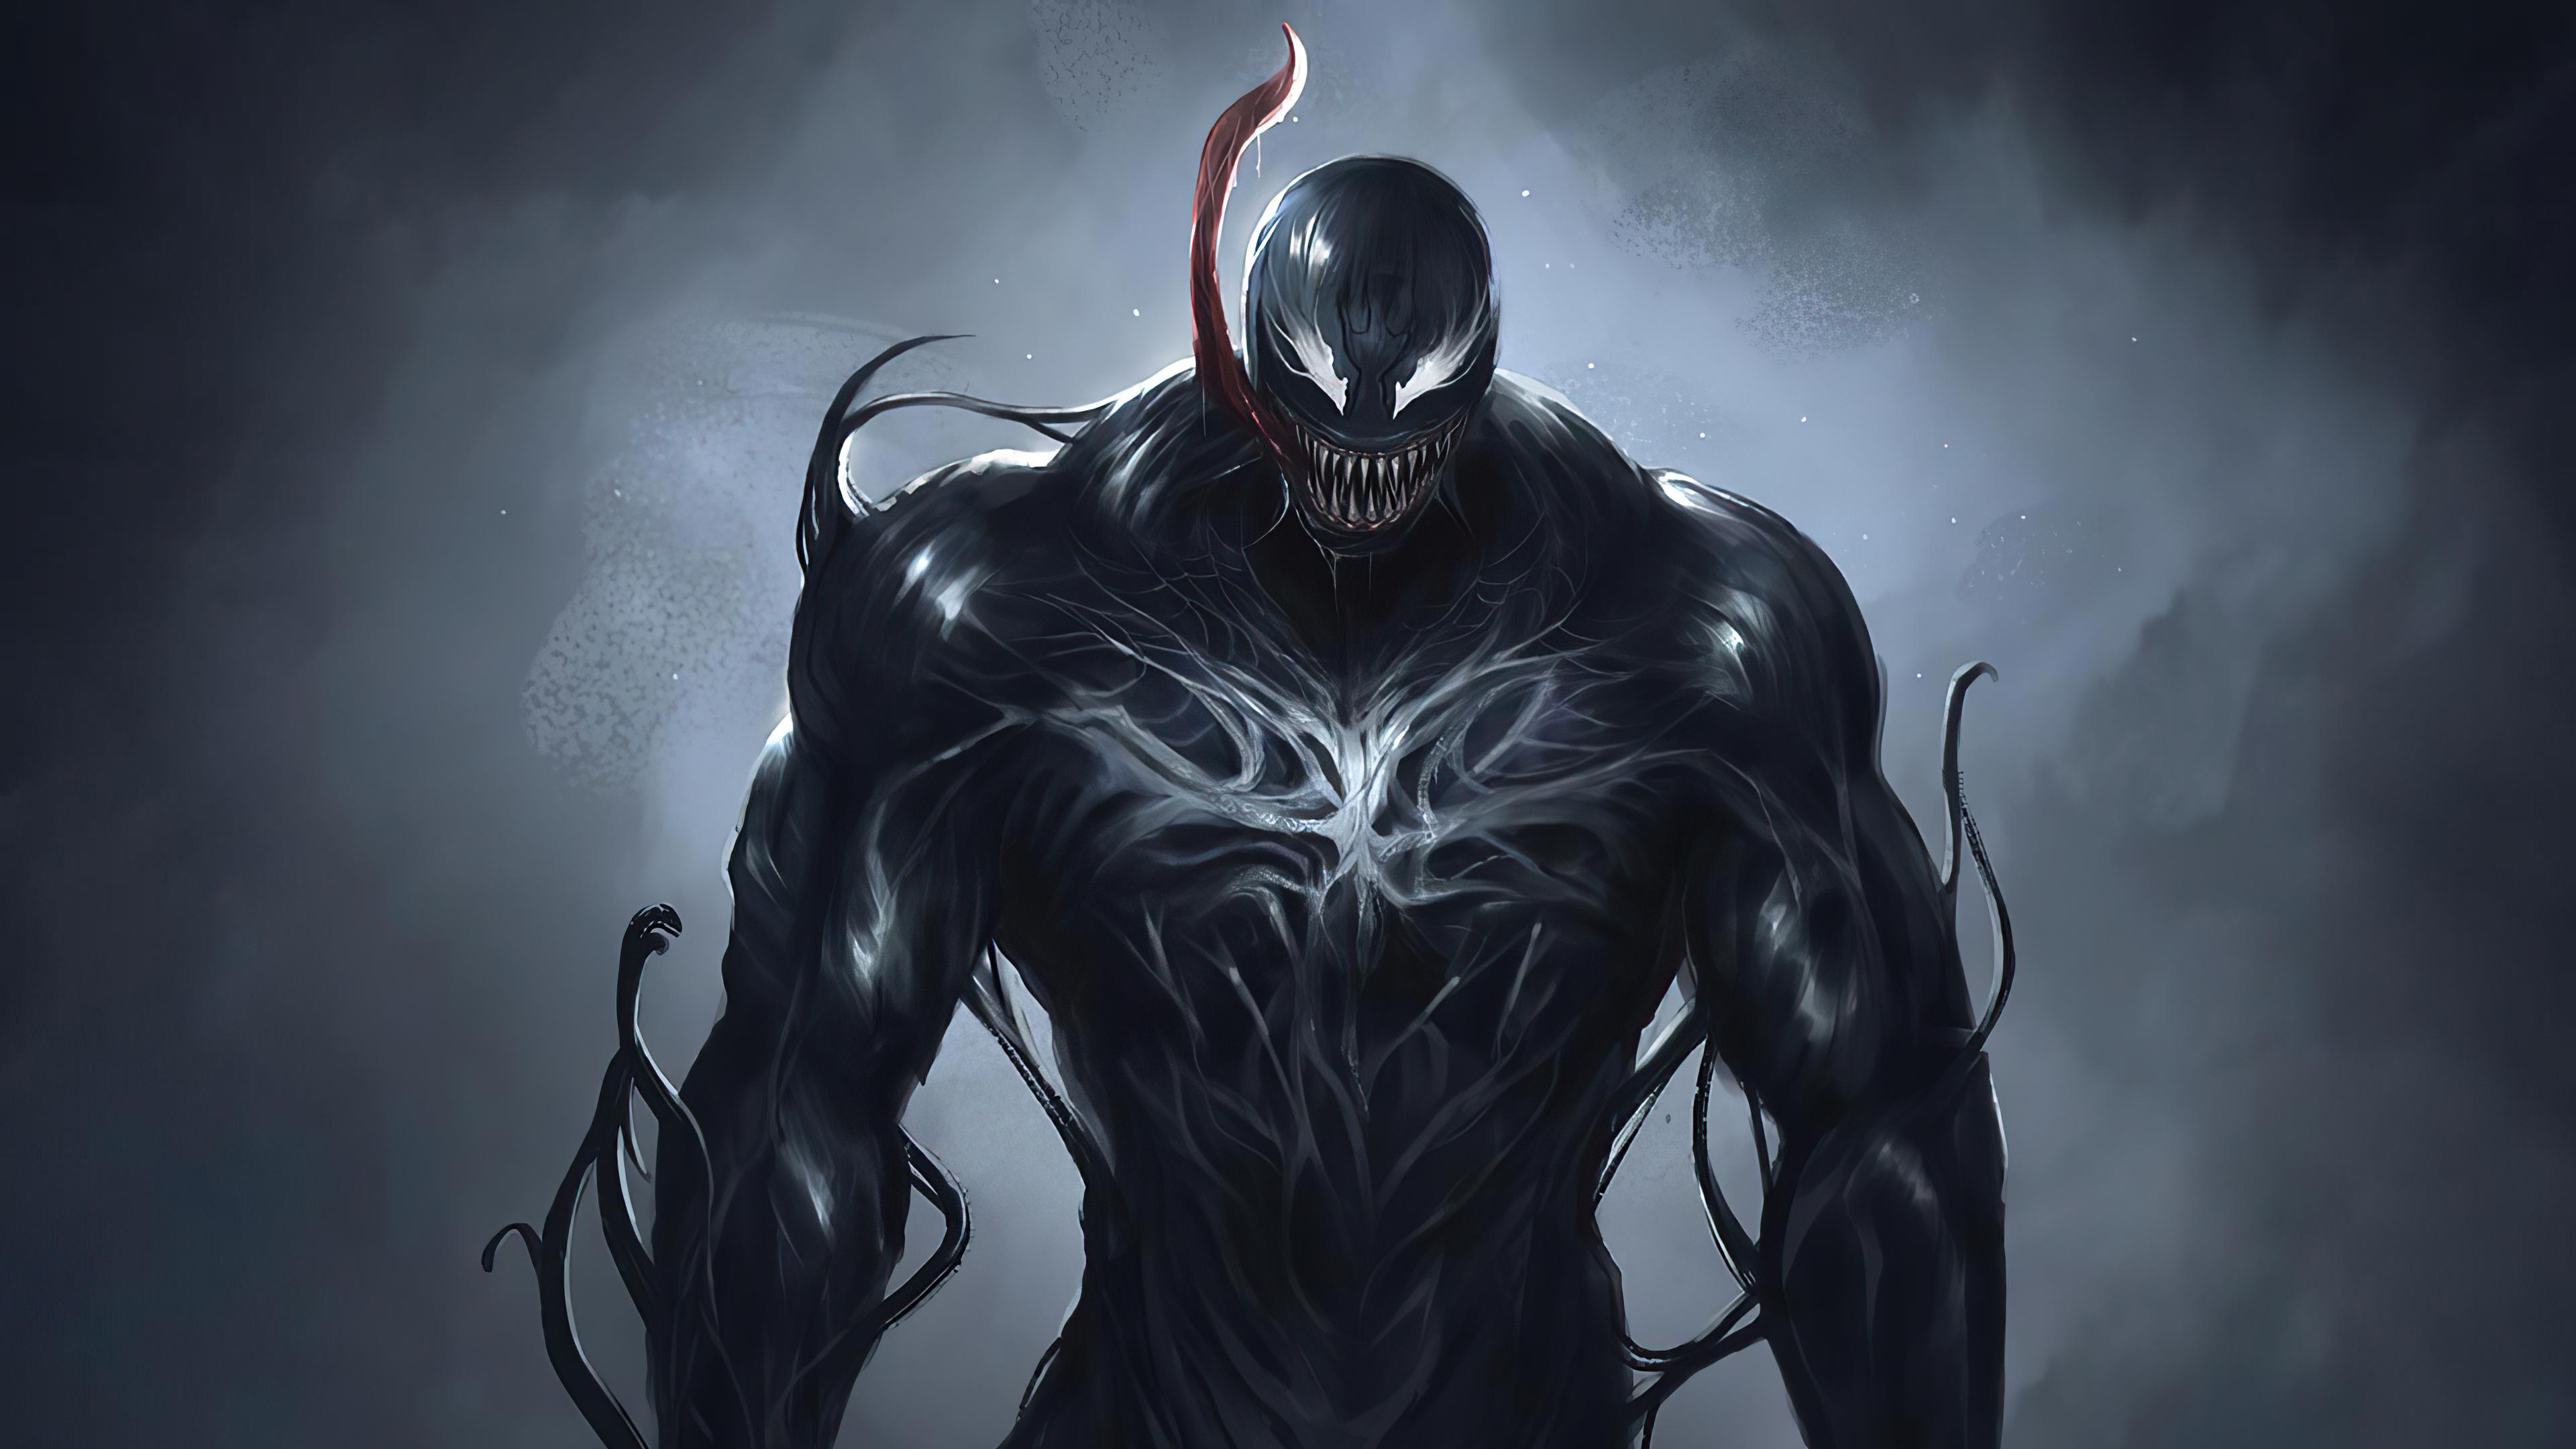 New Venom 2021 Art Wallpaper, HD Superheroes 4K Wallpapers ...